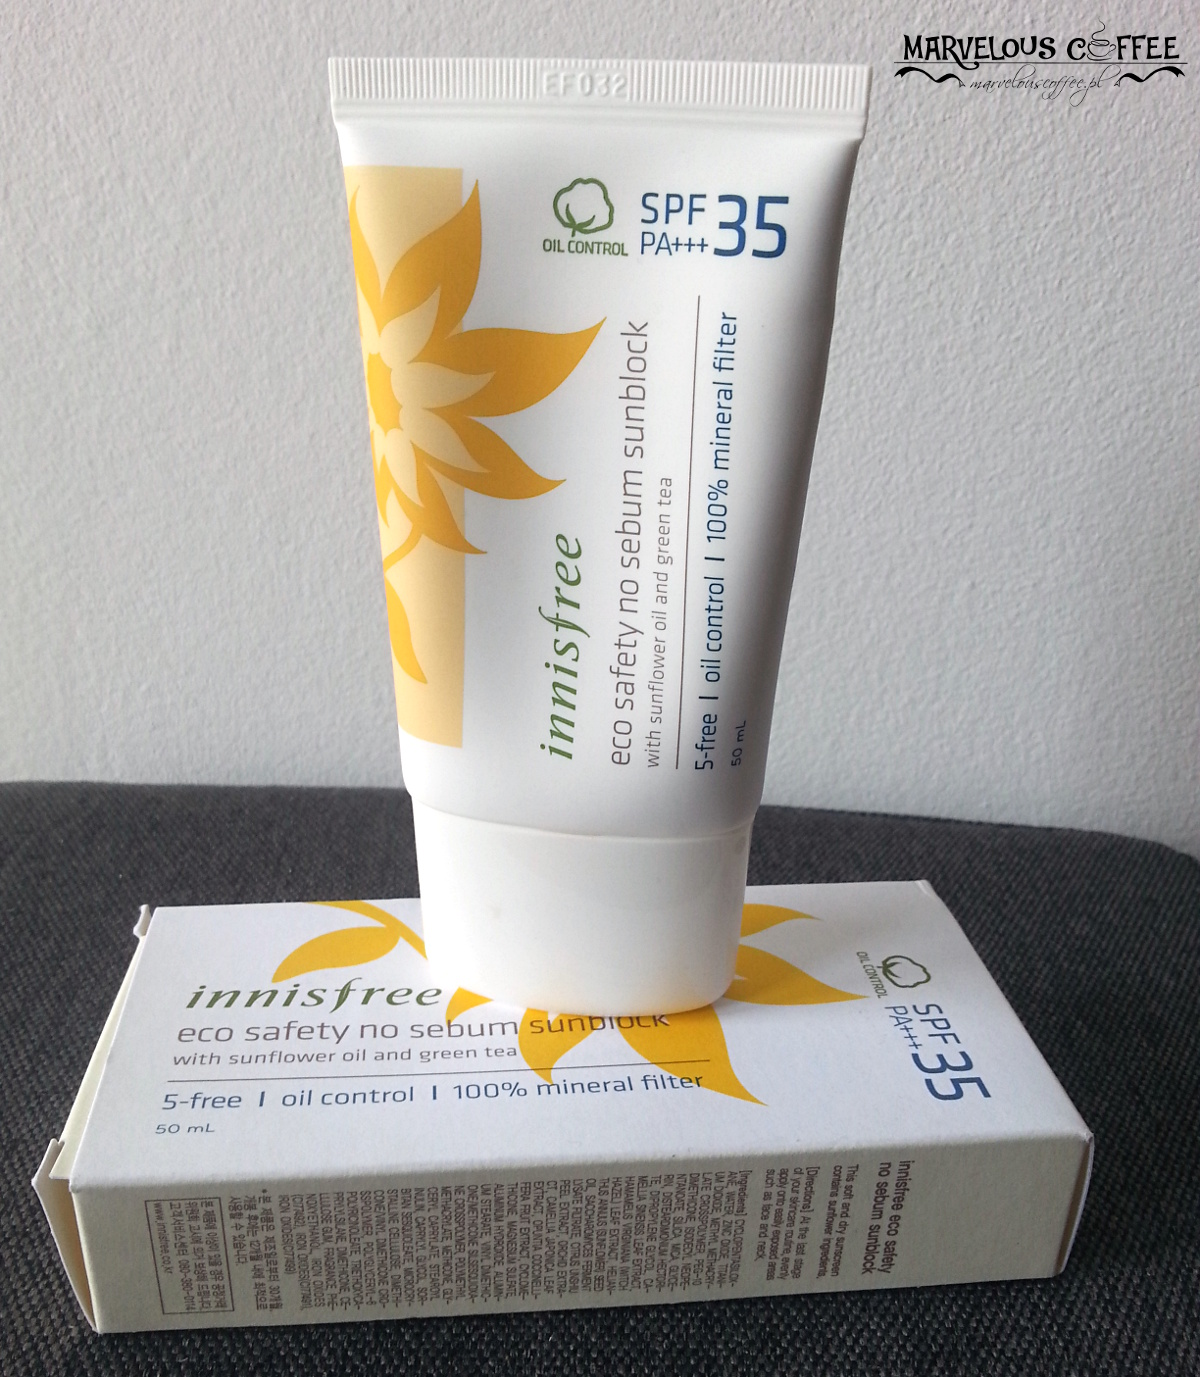 Innisfree Eco Safety No Sebum Sunblock SPF35 PA+++